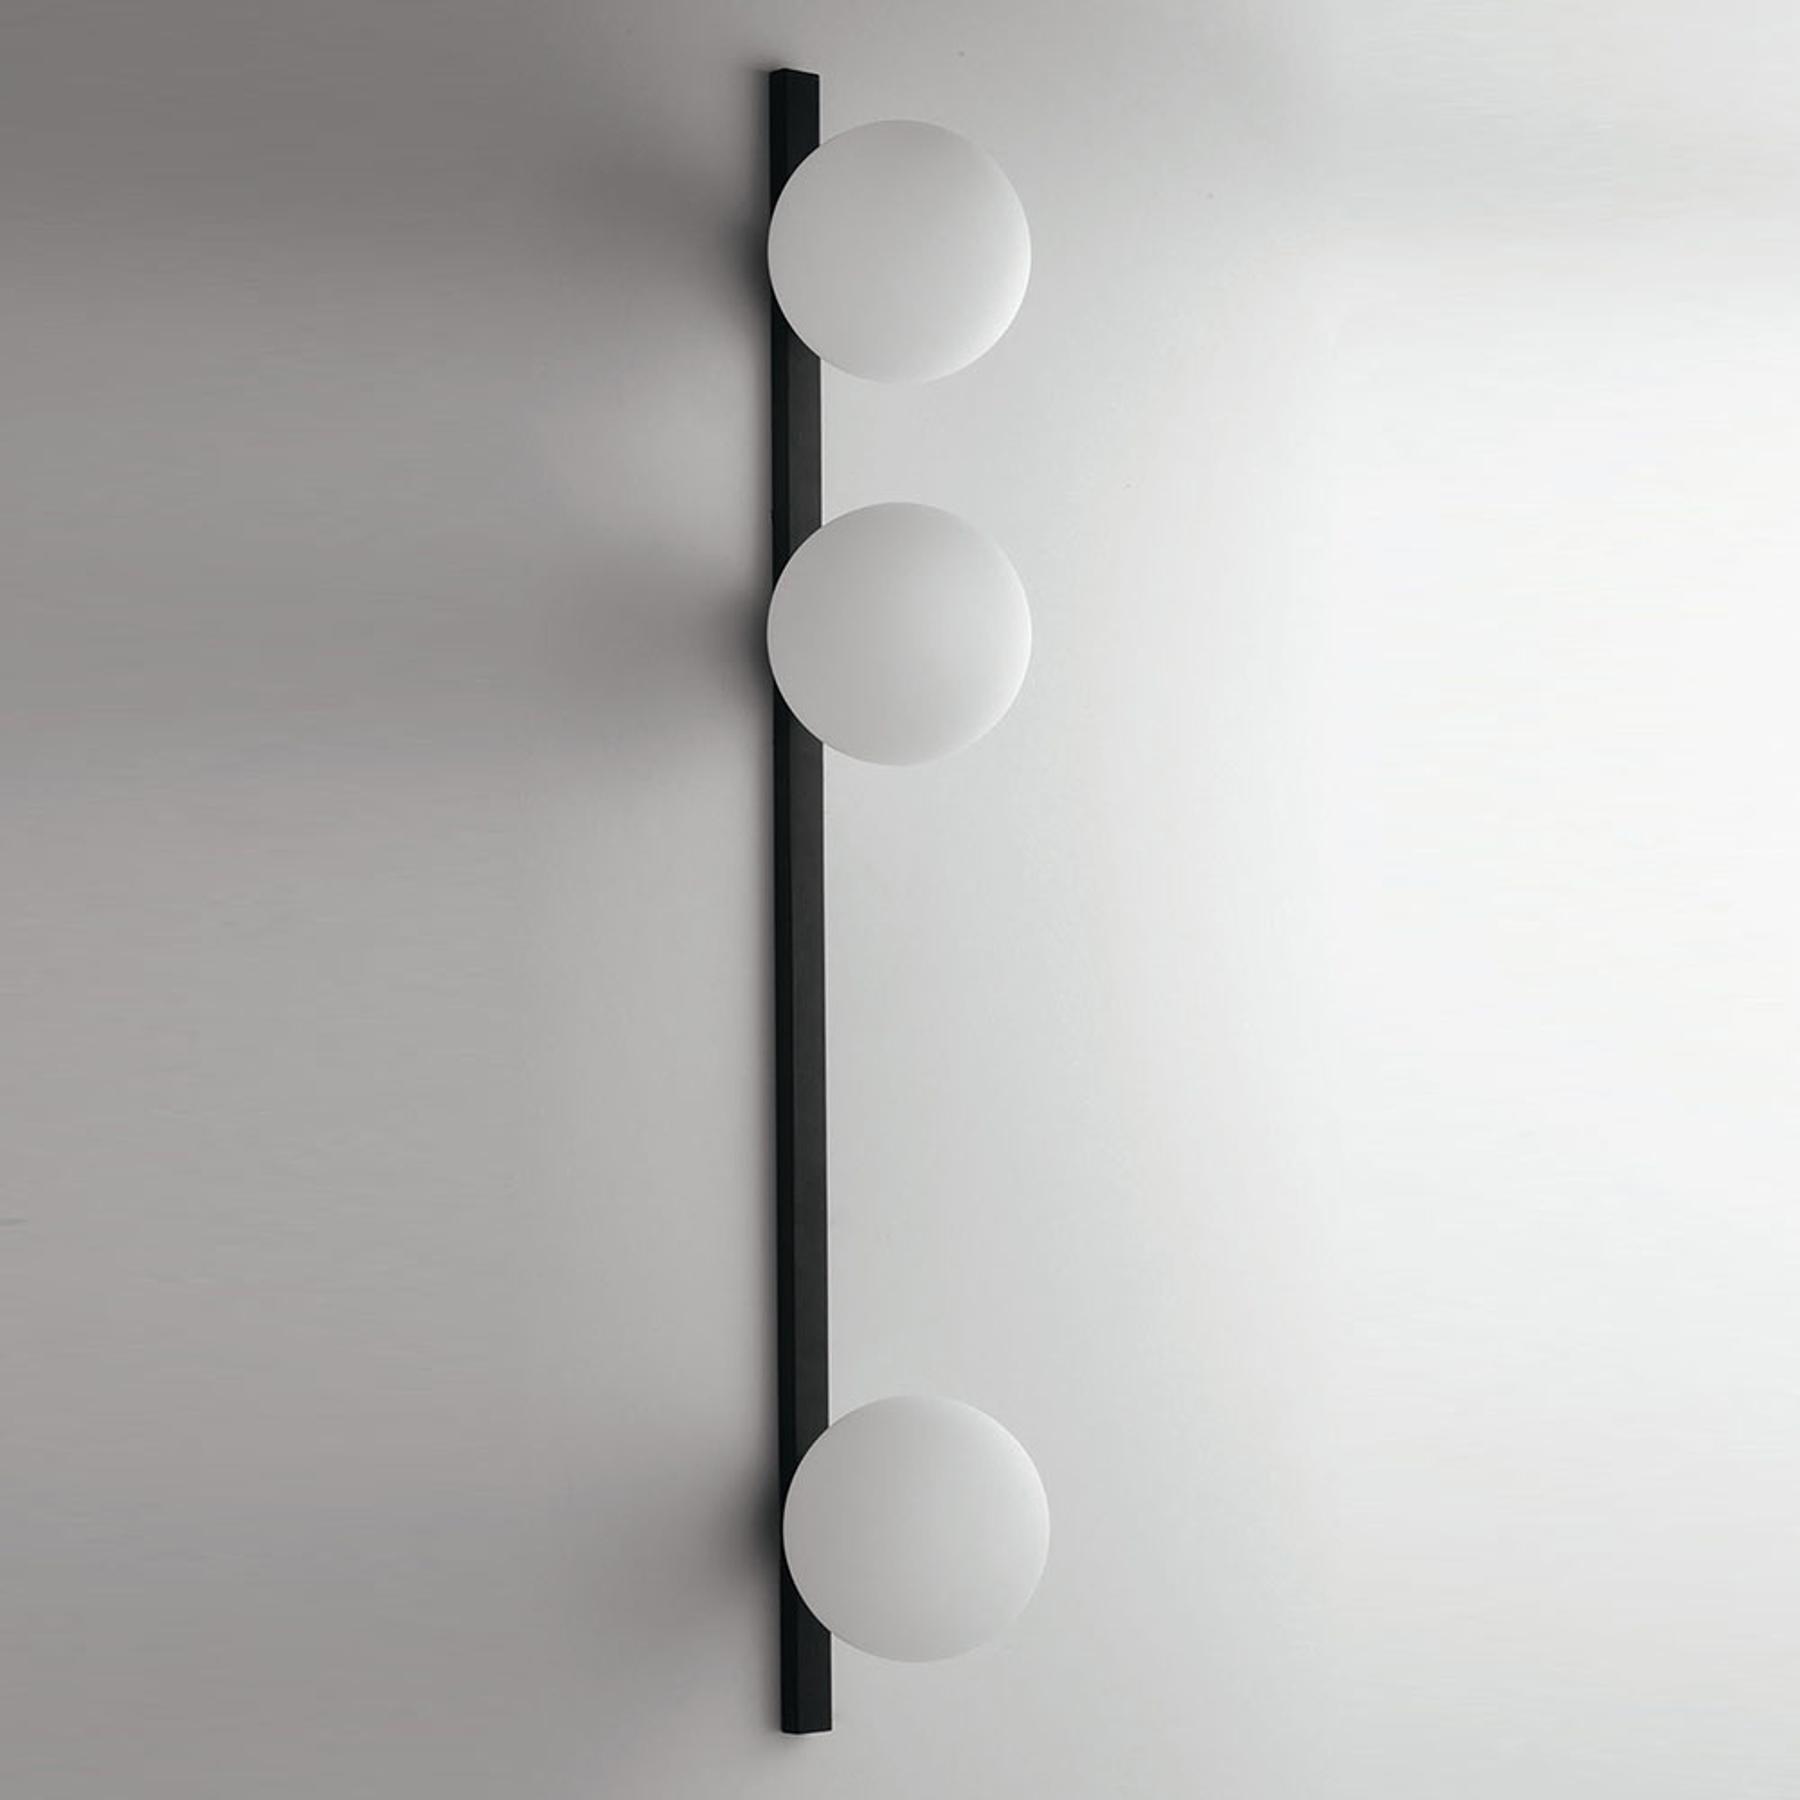 Wandlamp Enoire in zwart en wit, 3-lamps